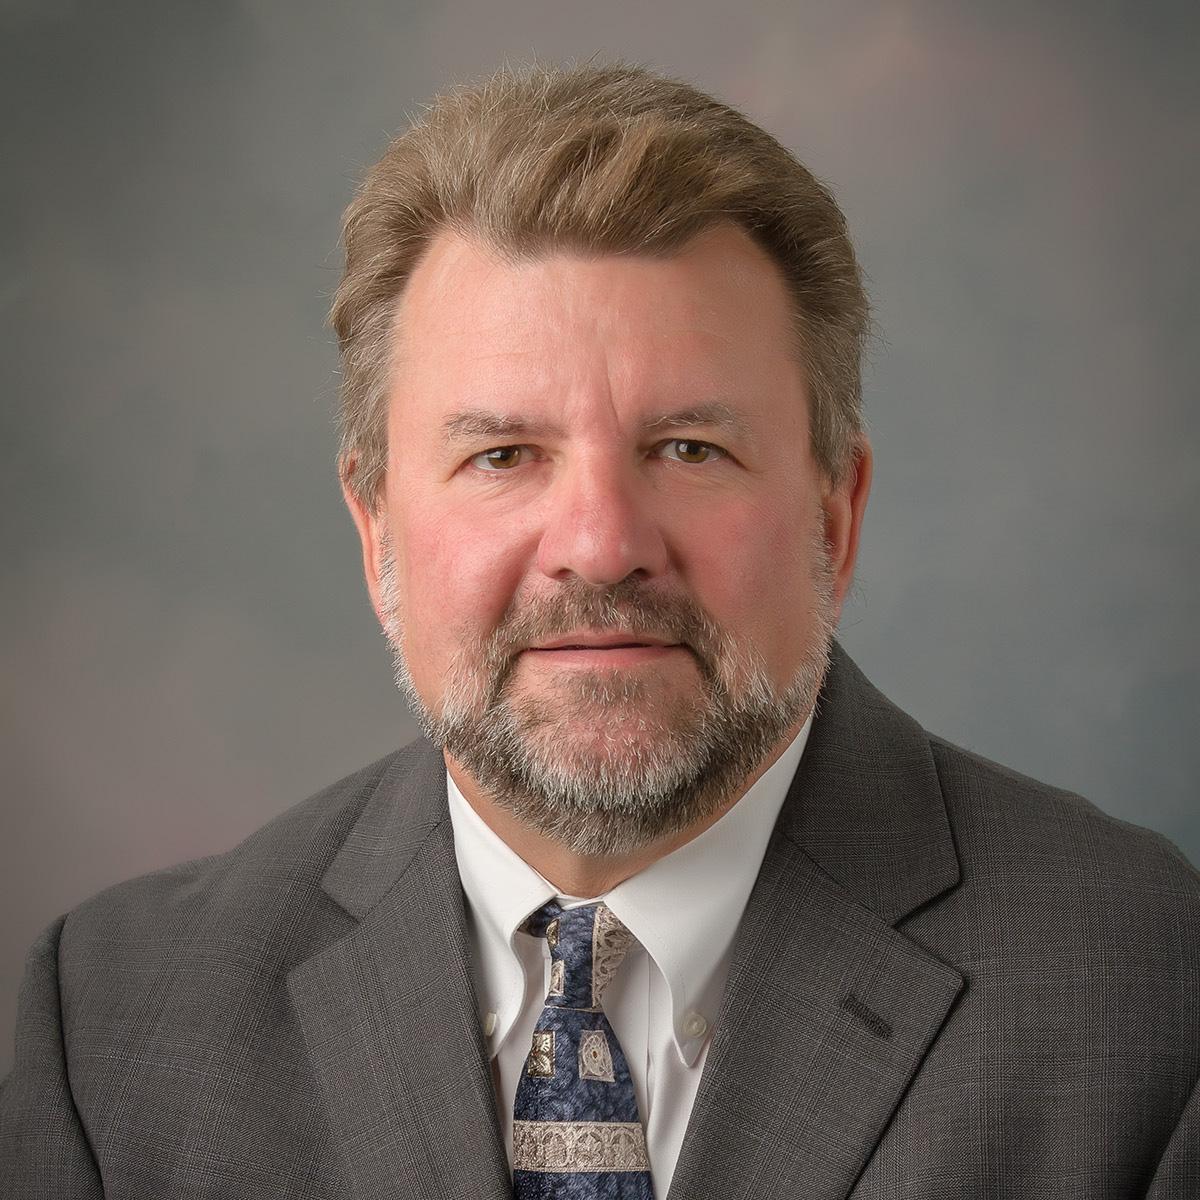 JOHN B. POWELL - Practice AreasPersonal Injury, General Litigation, Domestic Relations